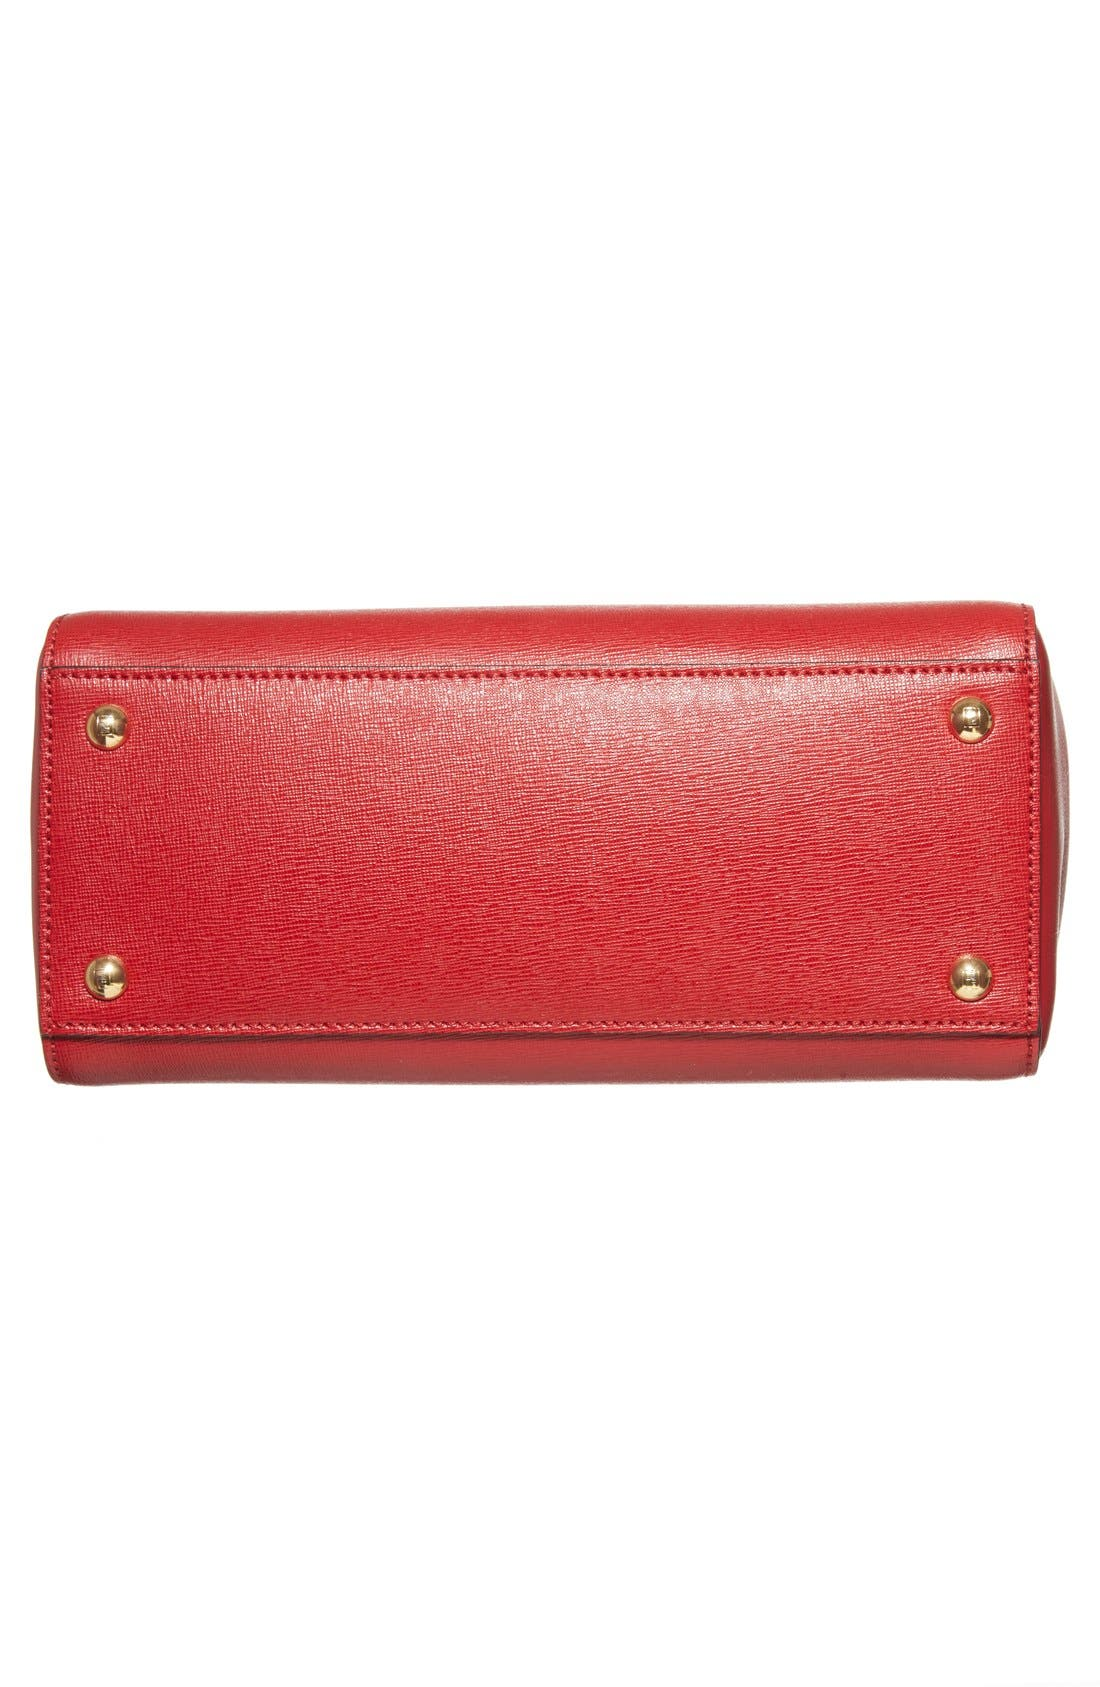 'Petite 2Jours Elite' Leather Shopper,                             Alternate thumbnail 105, color,